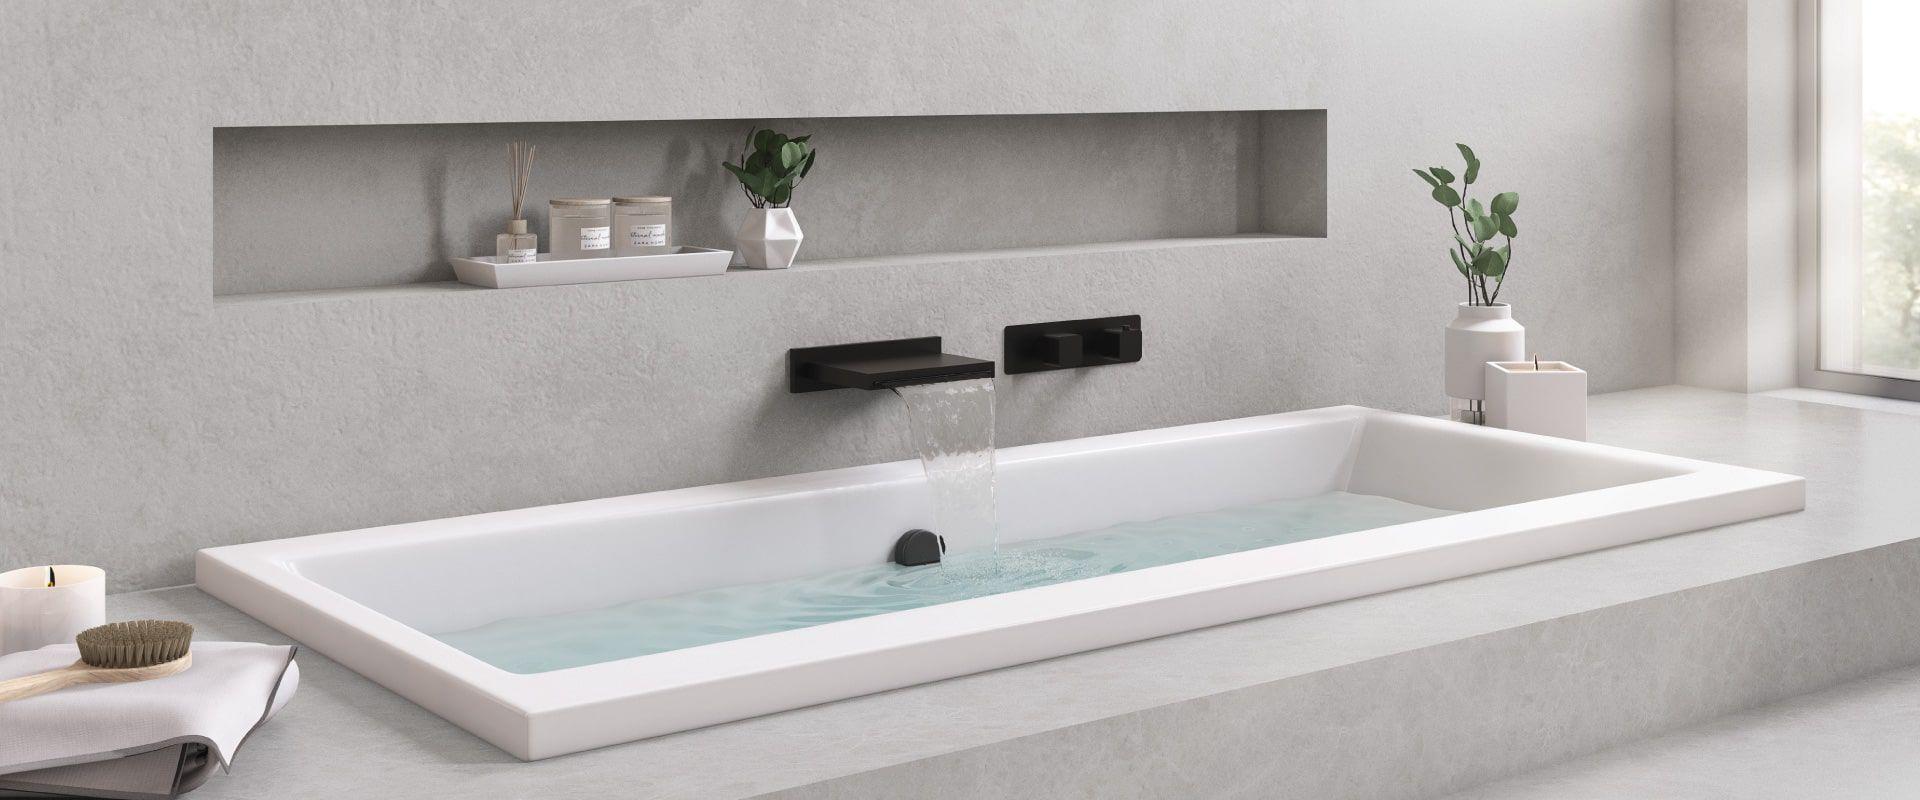 RM Living Interior Design Modern Bathroom Sink by Isenberg Isenberg5